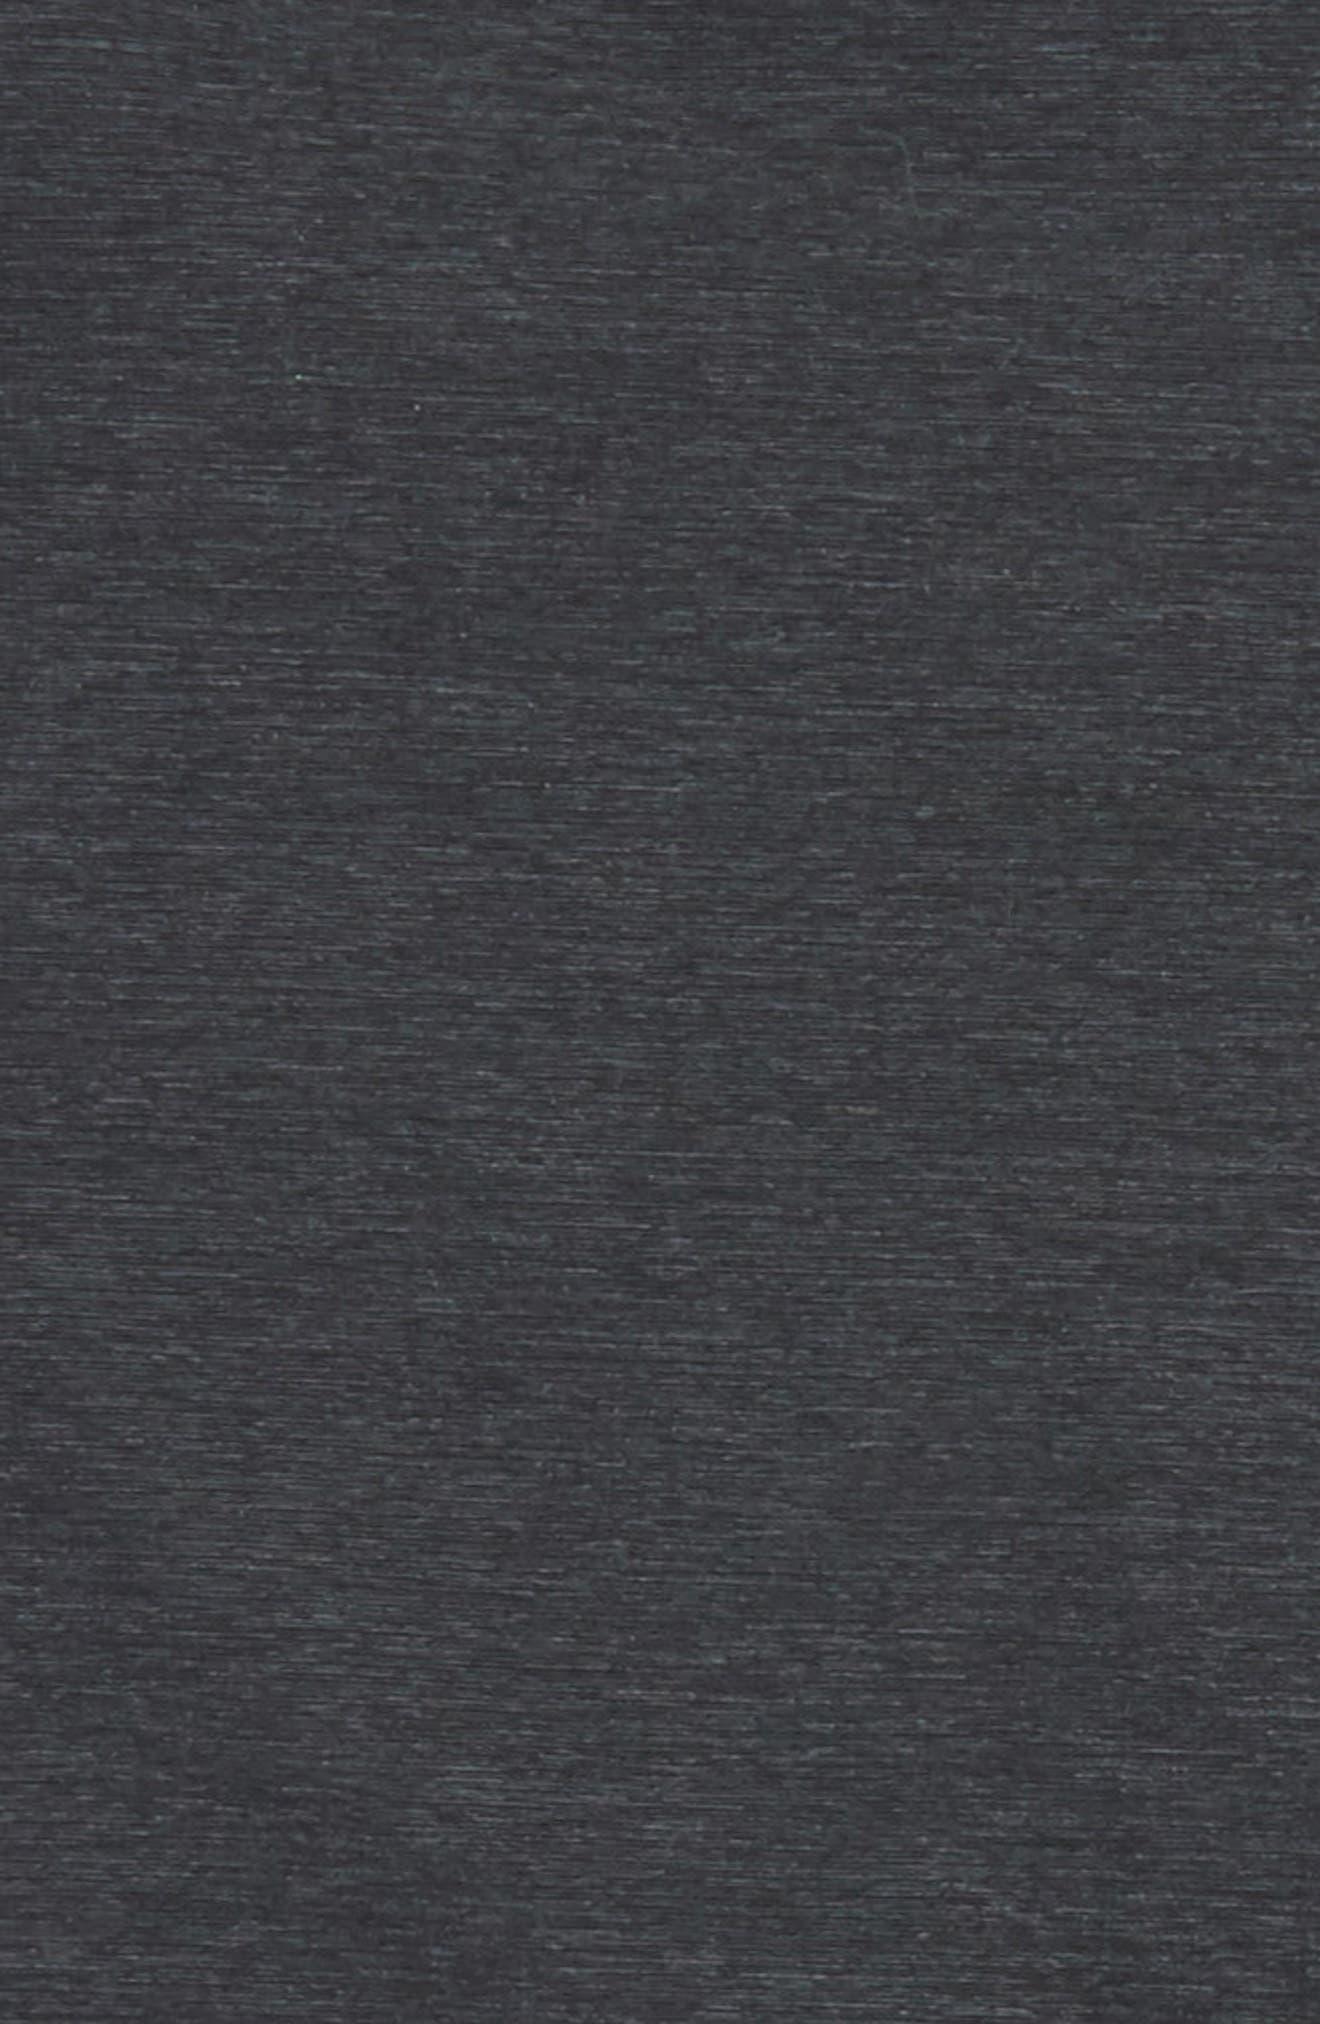 Magnolia Waterproof HyVent<sup>®</sup> Rain Jacket,                             Alternate thumbnail 2, color,                             021